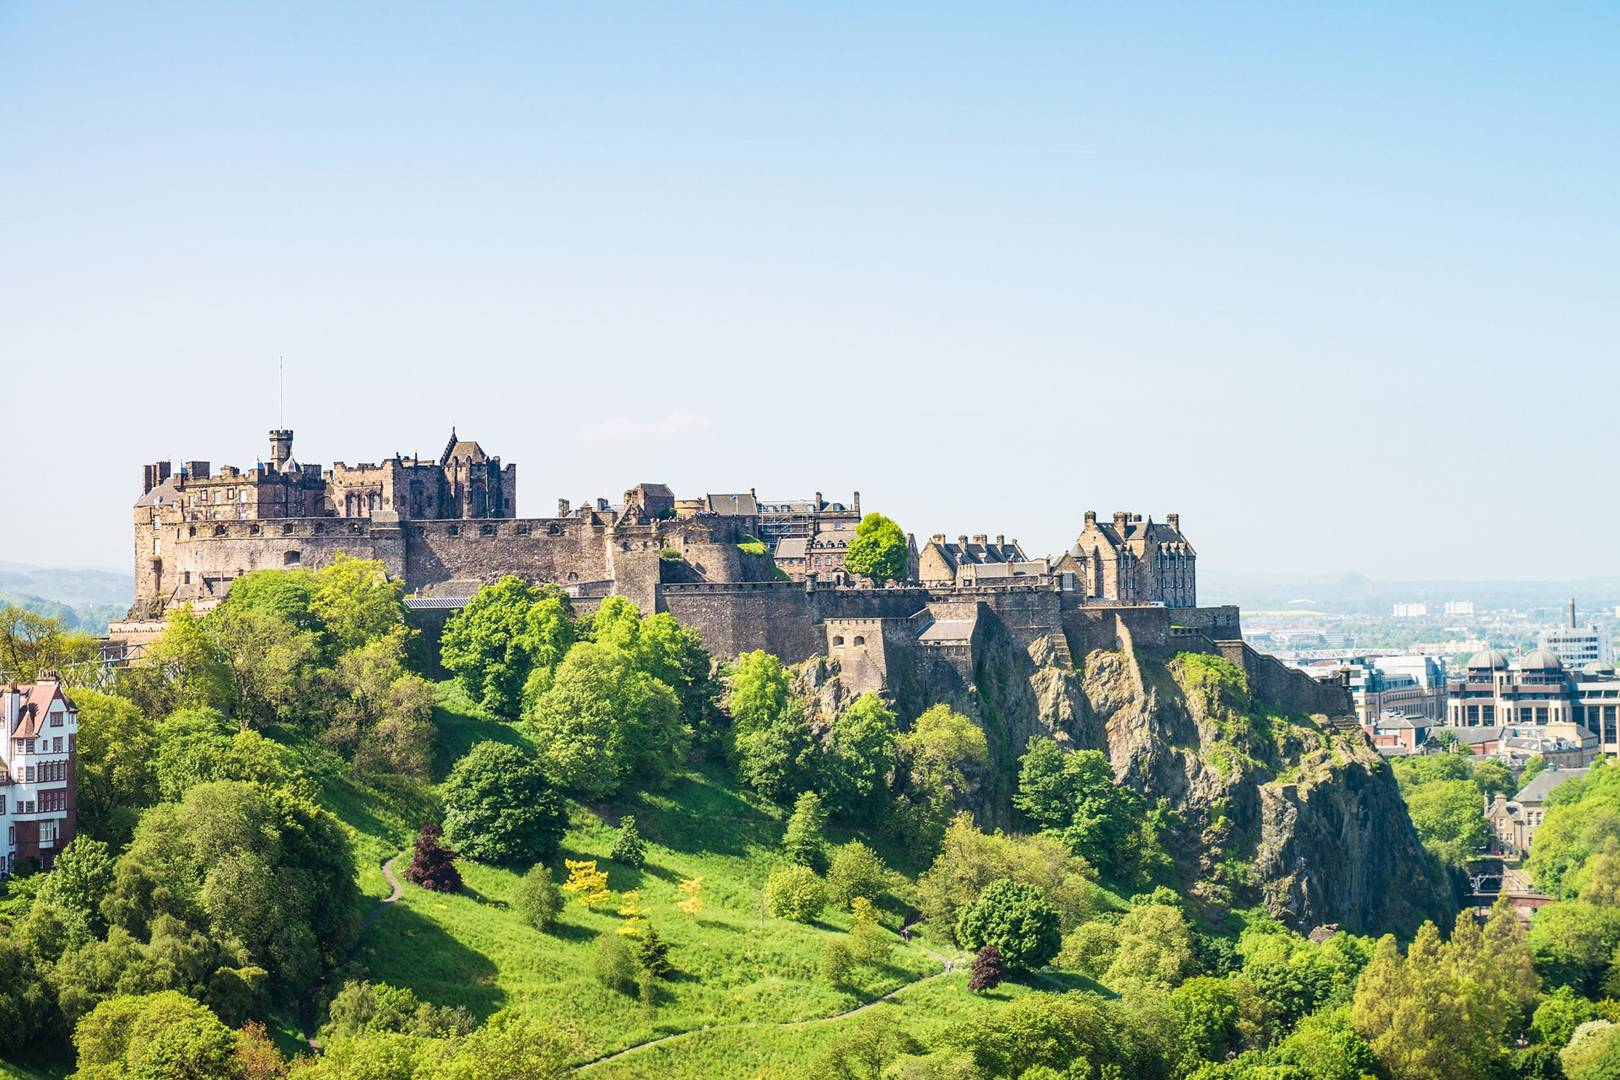 Edinburgh-Castle-edinburgh-scotland-conde-nast-traveller-28july17-iStock